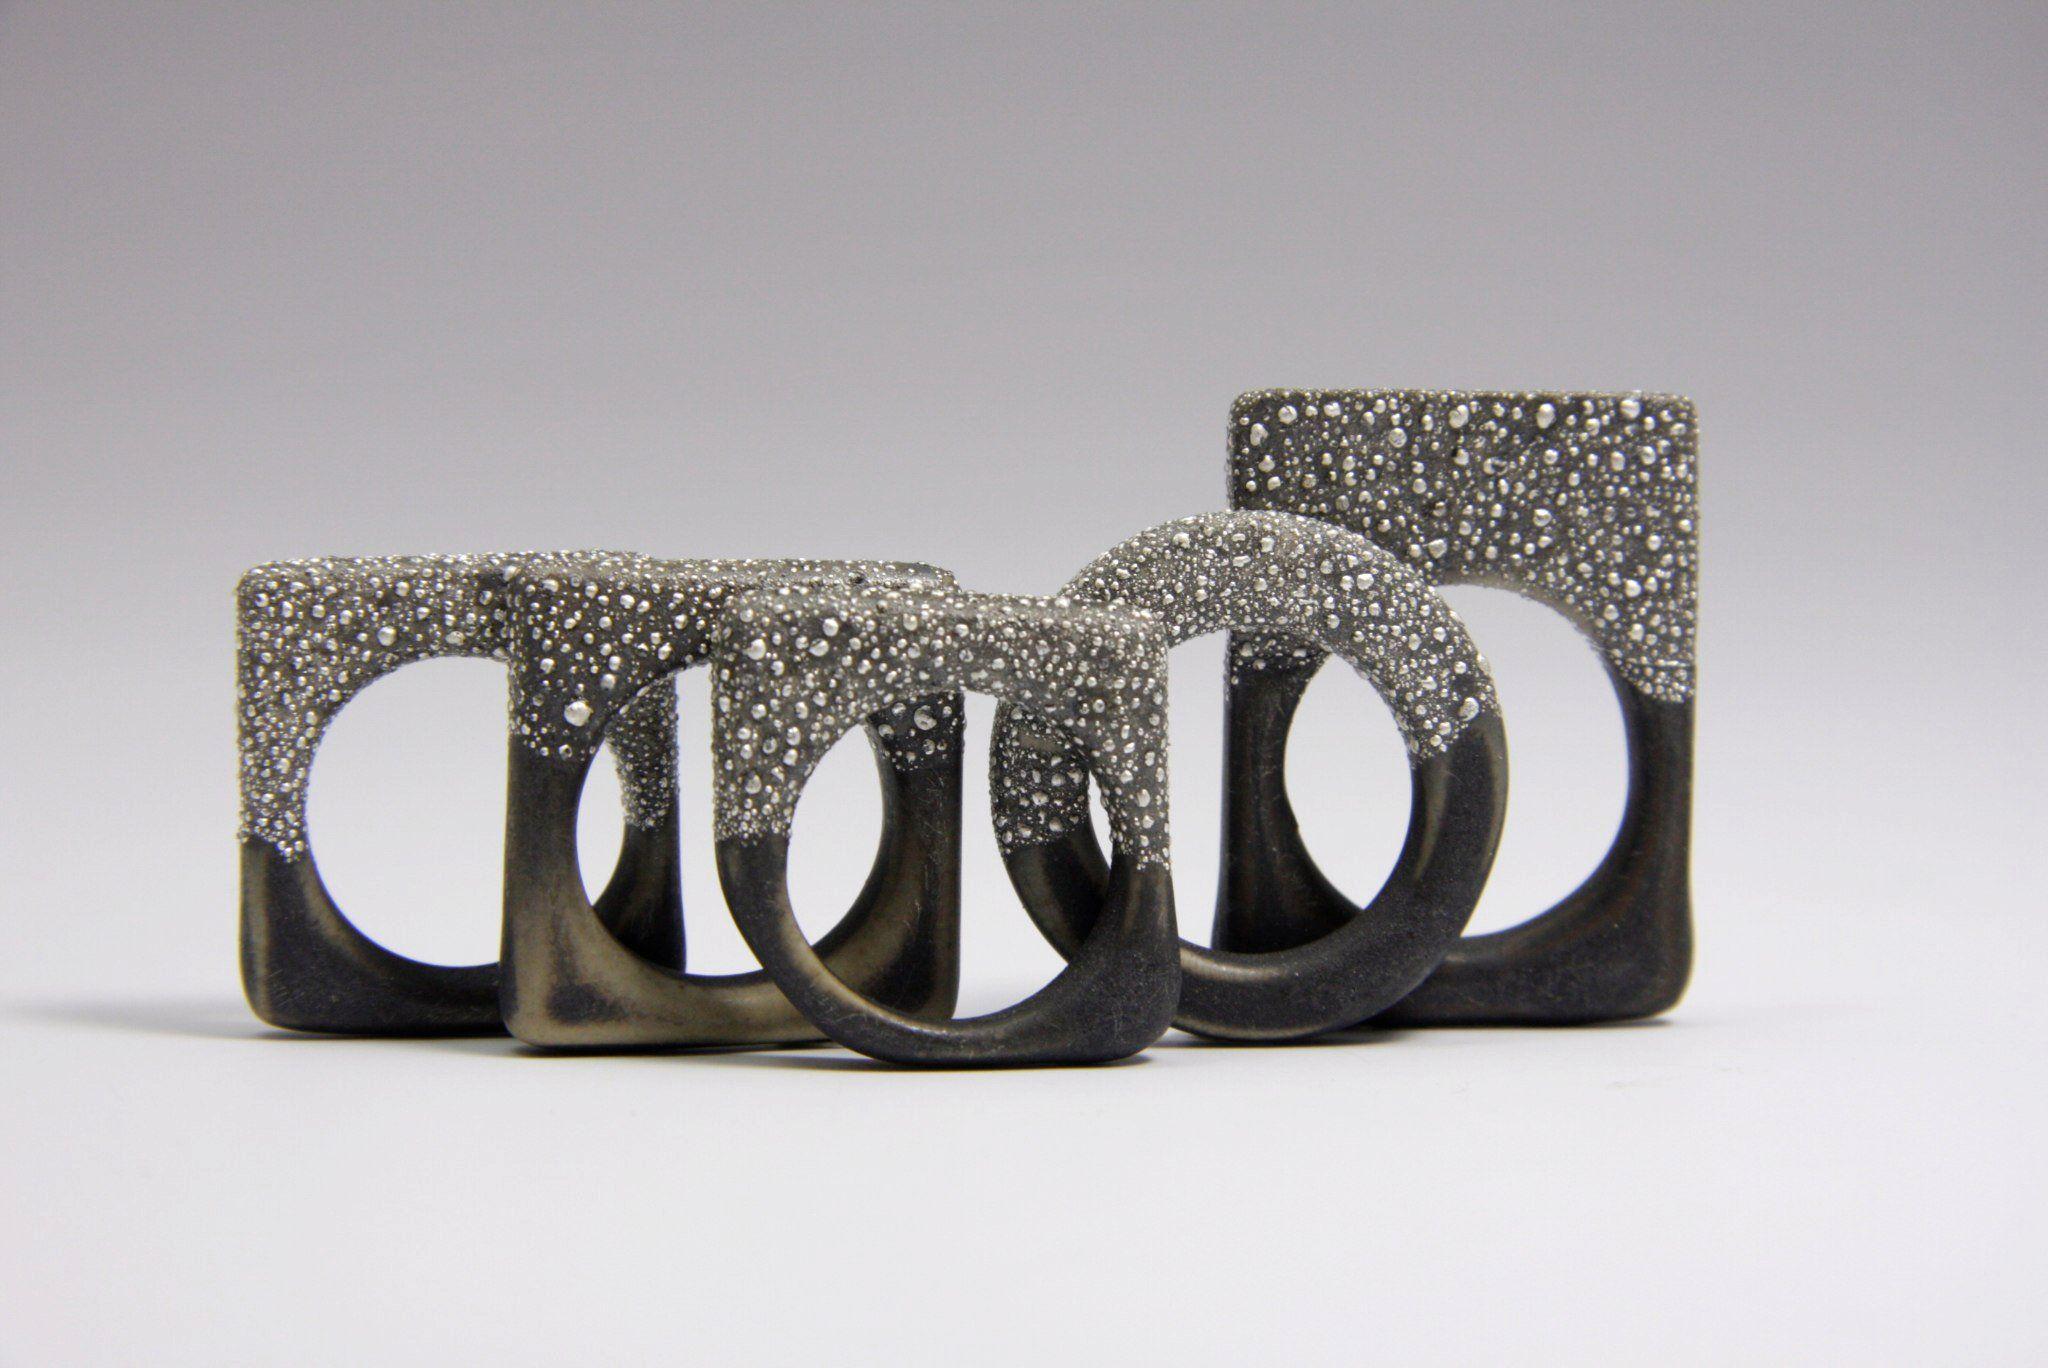 Violaine Ulmer - céramique, argent - rings